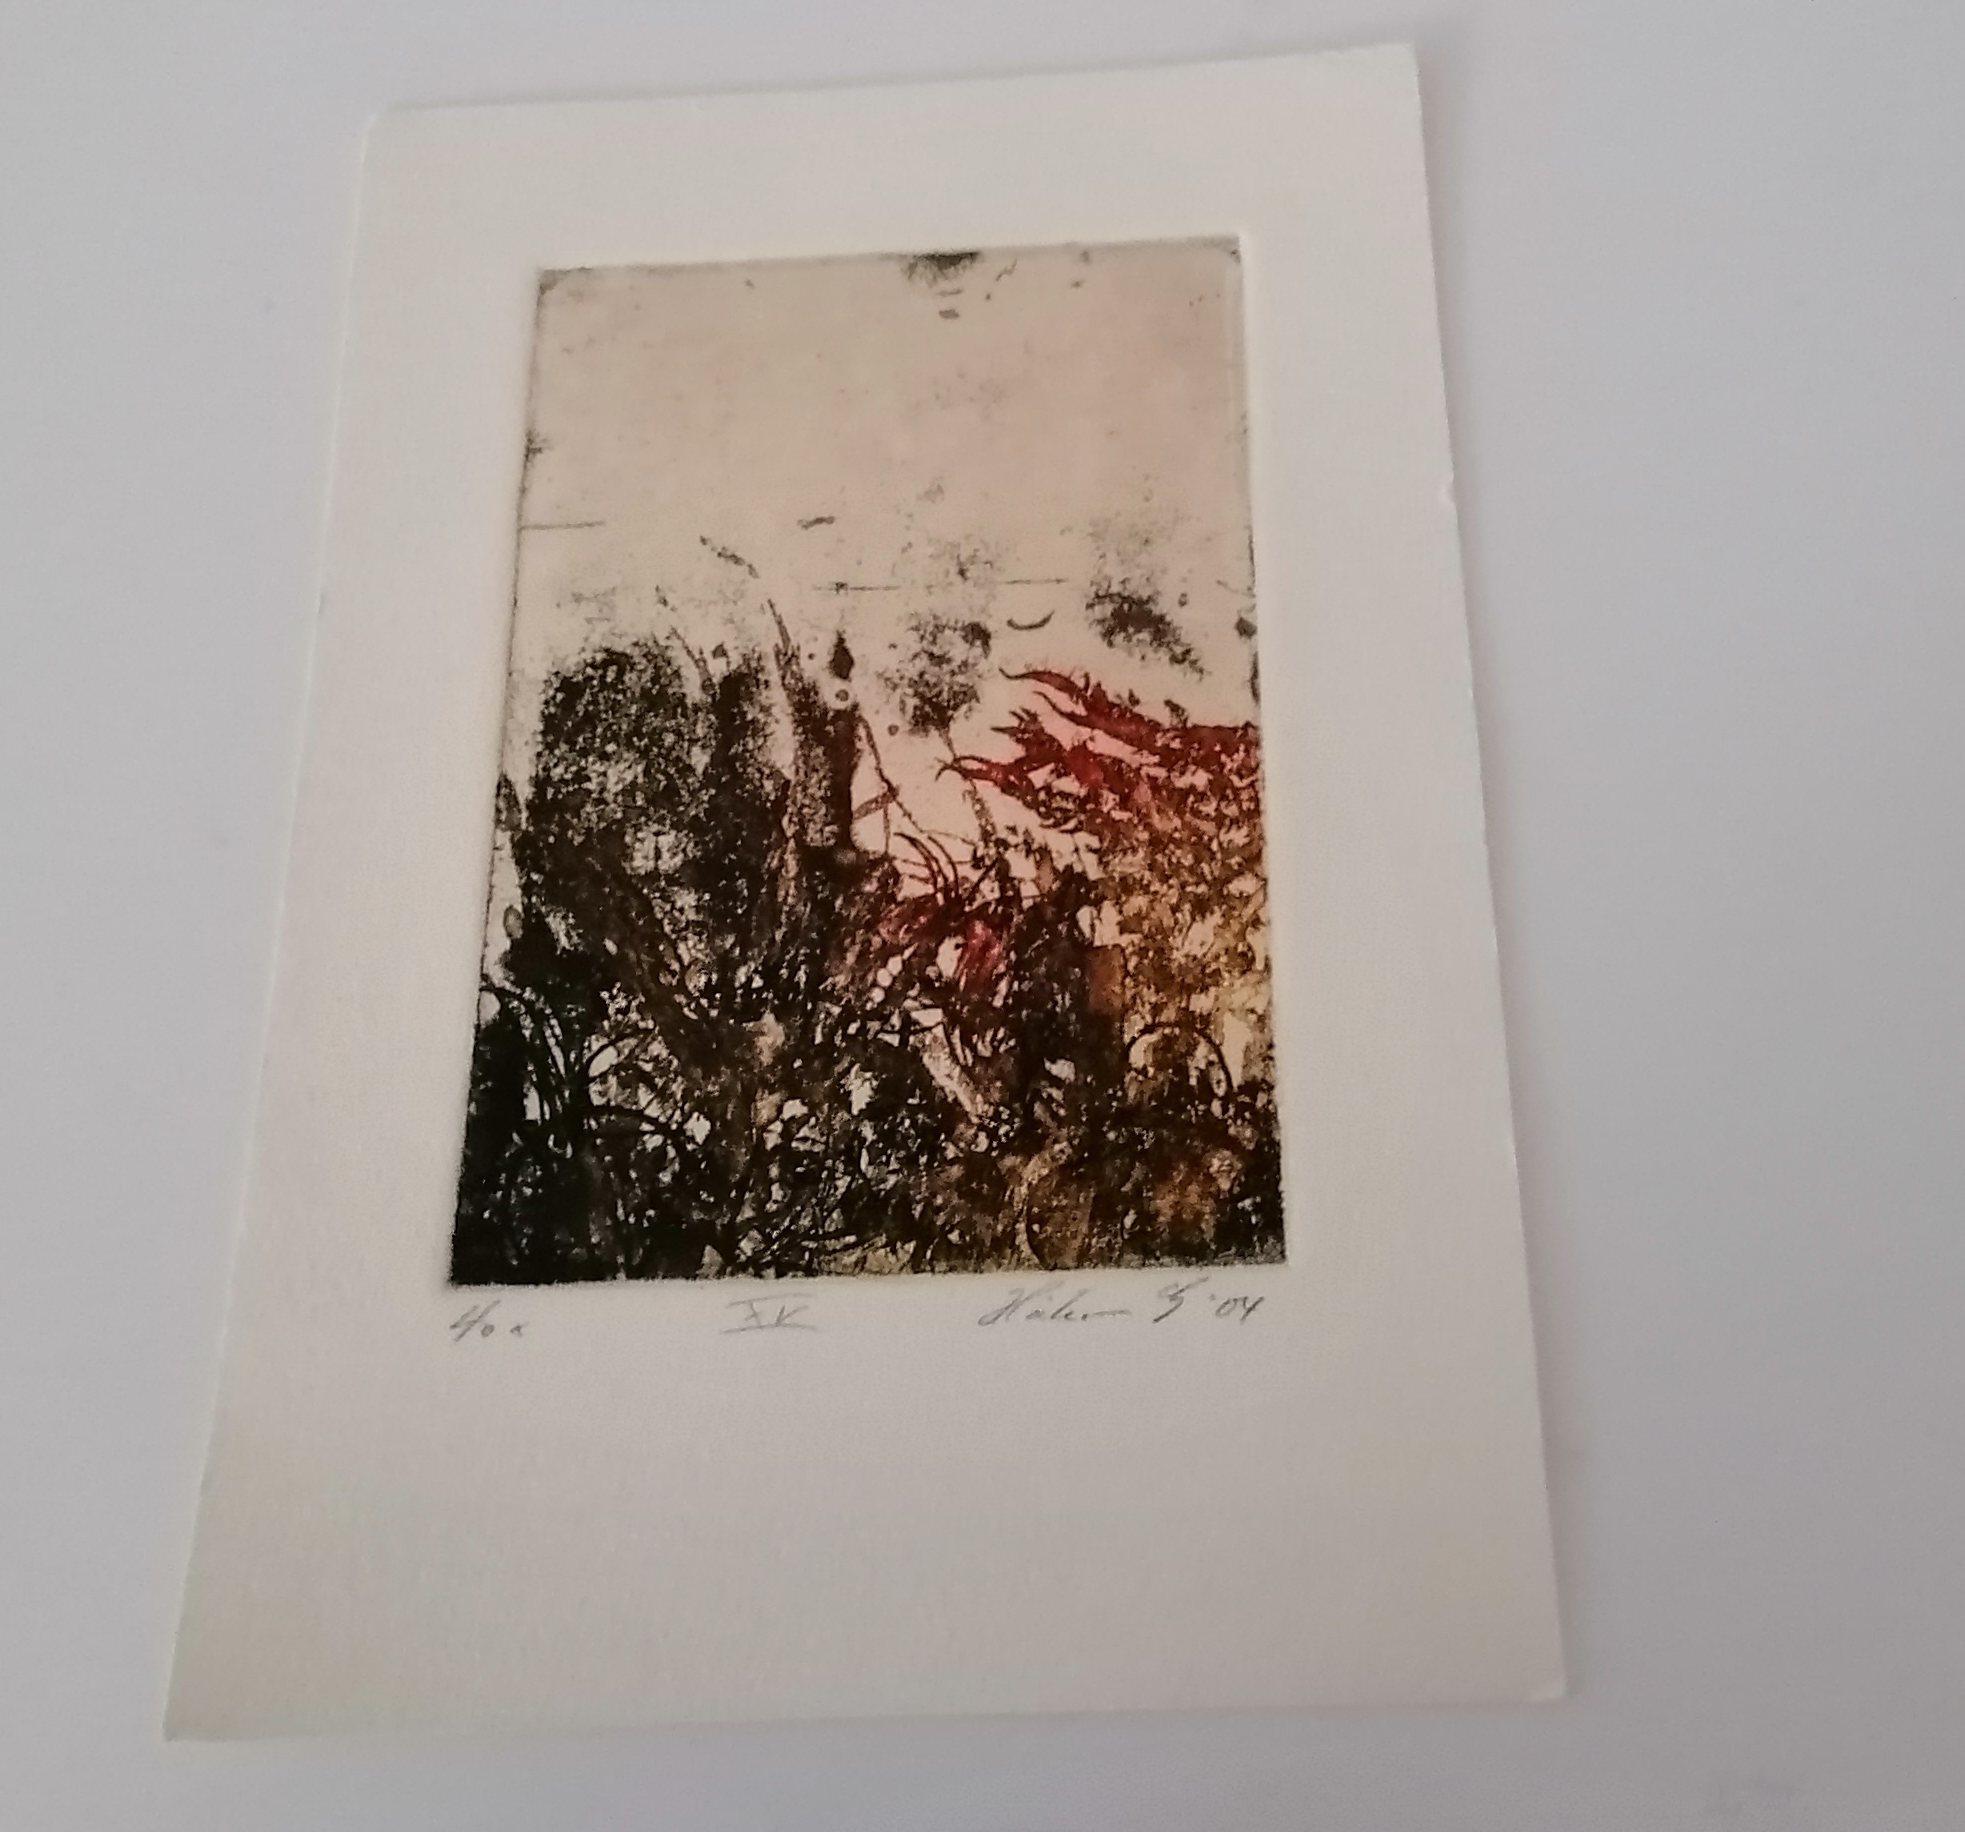 https://www.norstamps.com/content/images/stamps/gtgallerier/199.jpg